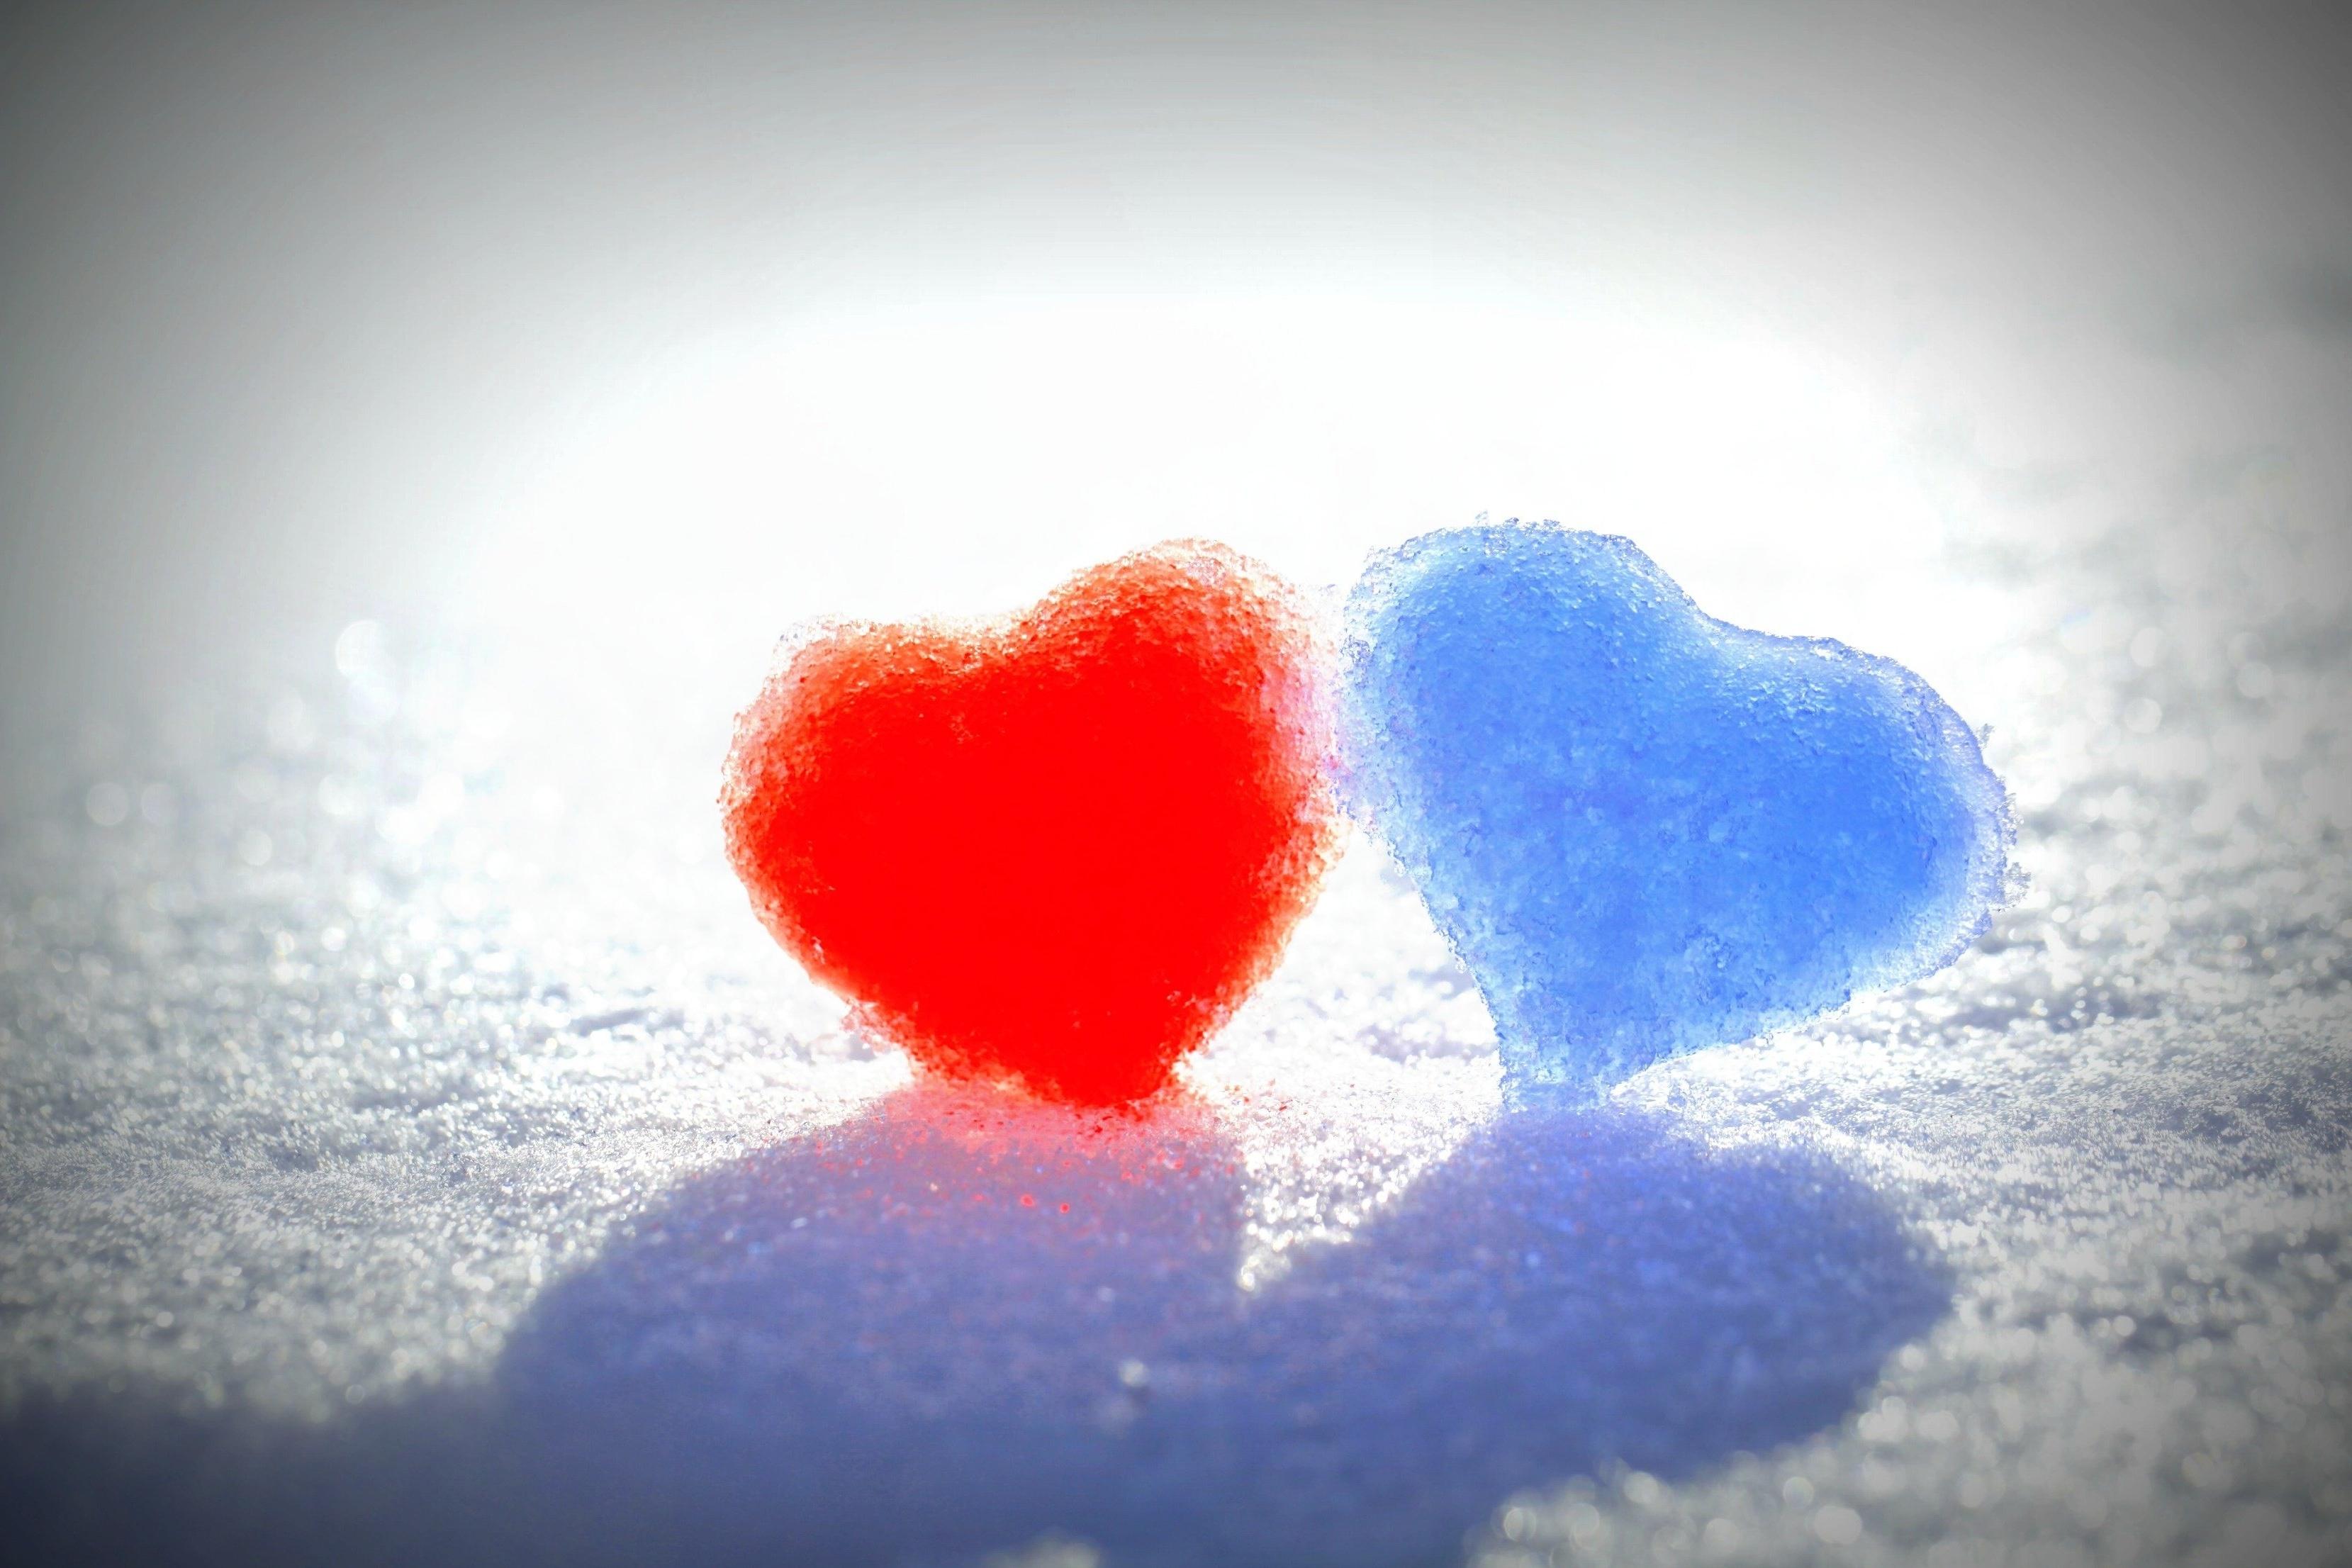 Best Wallpaper Love Winter - 3318x2212-px-heart-love-mood-snow-winter-805511  Trends_74415.jpg